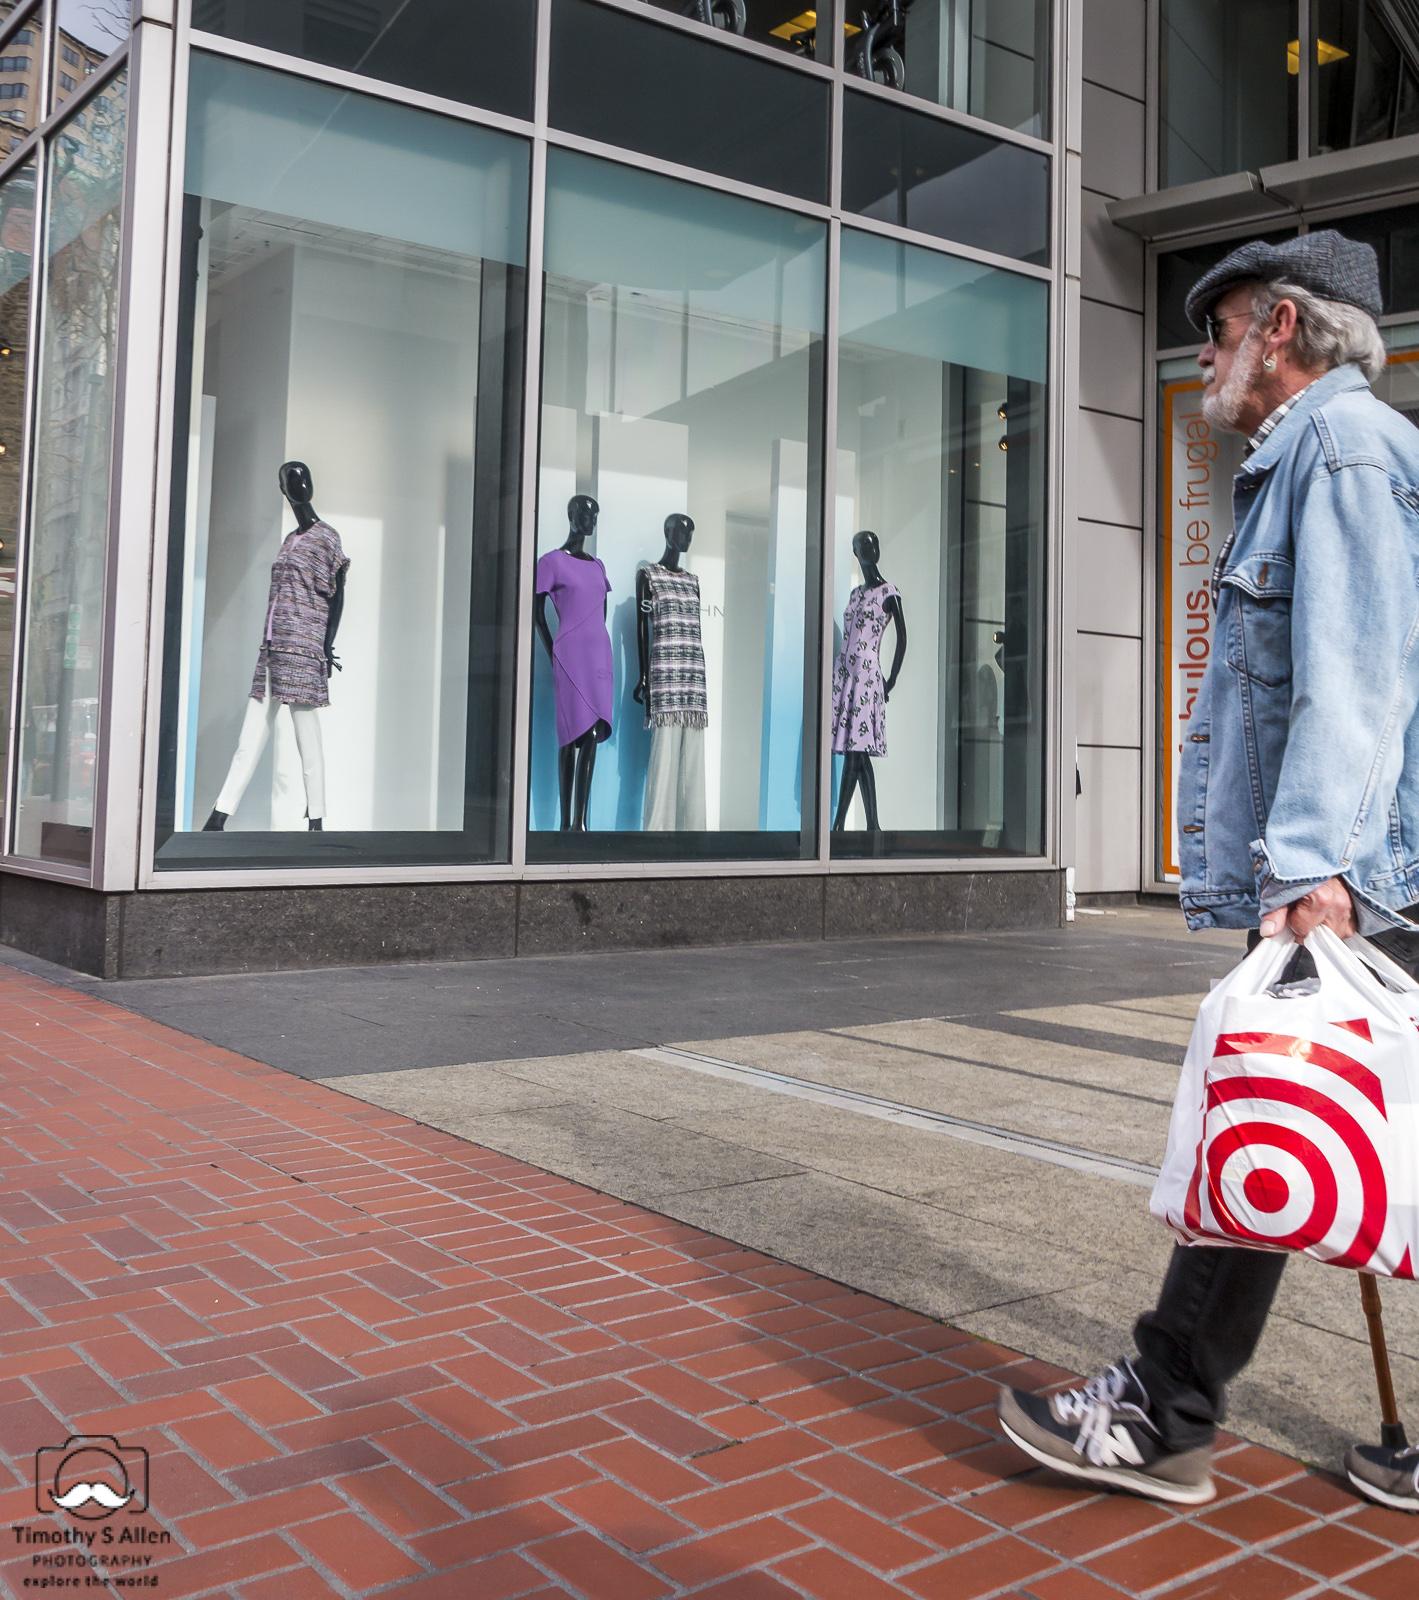 Market Street, San Francisco, CA, U.S.A. March 9, 2018